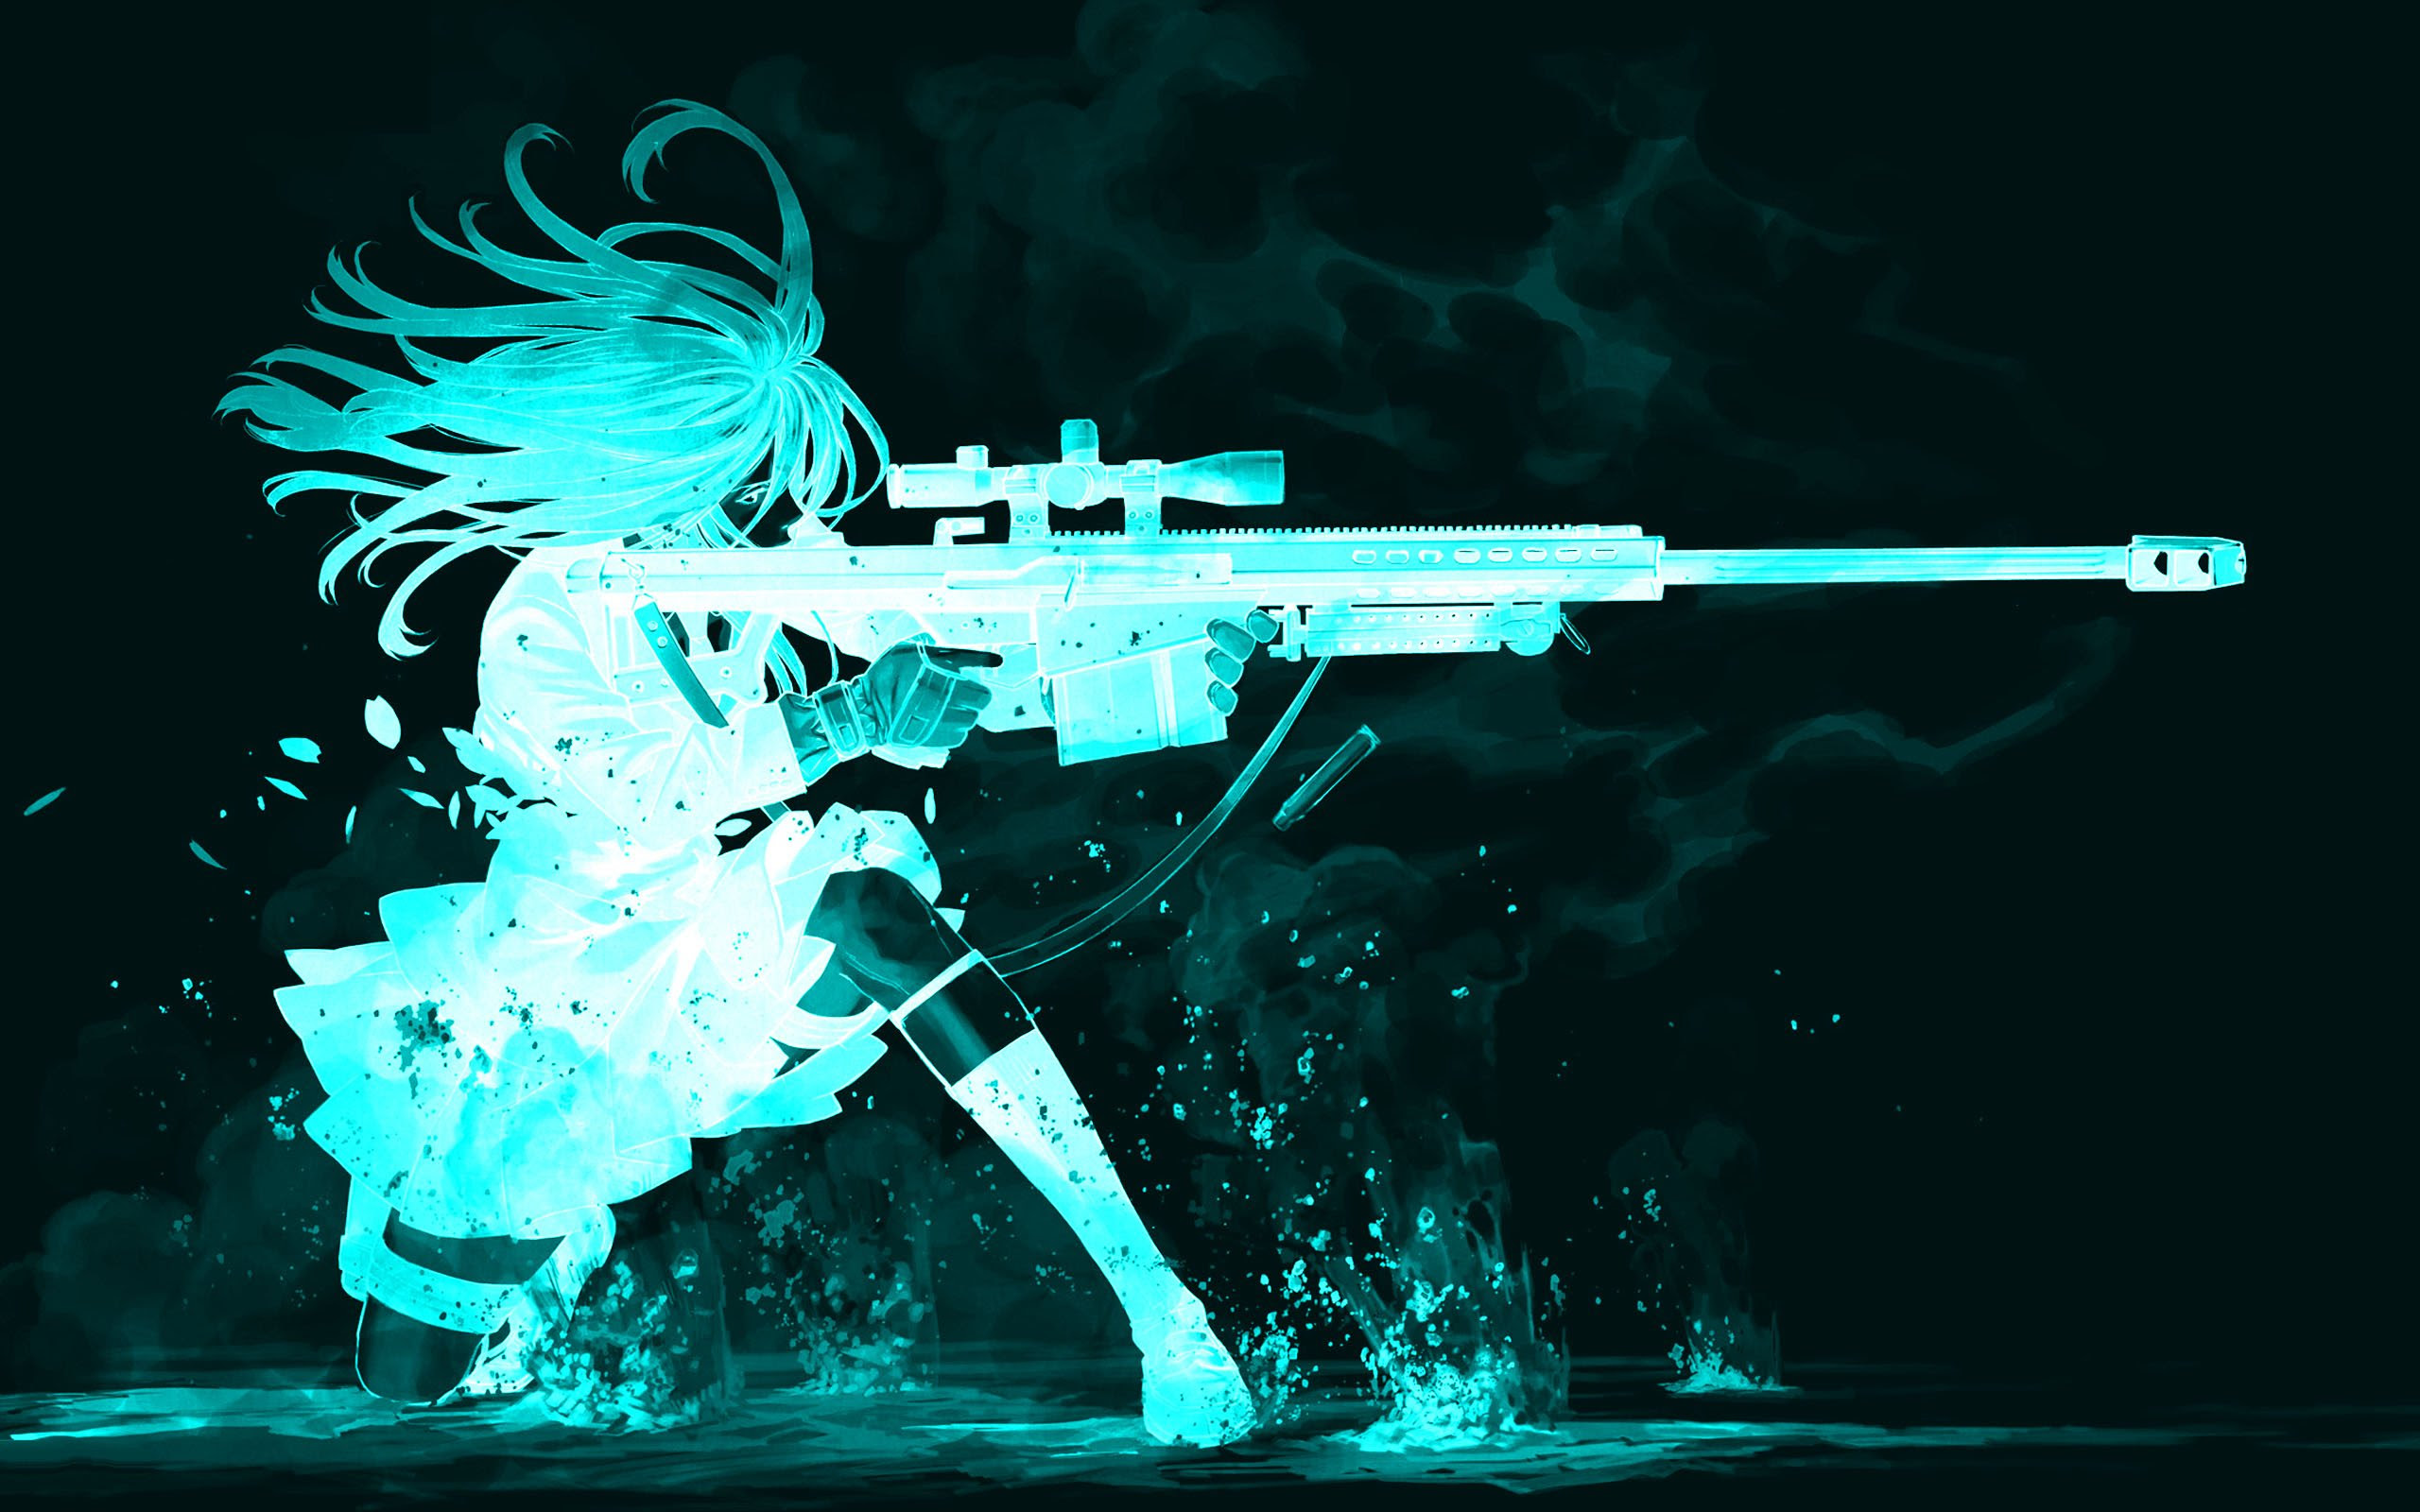 Cool Anime Wallpapers Hd - WallpaperSafari